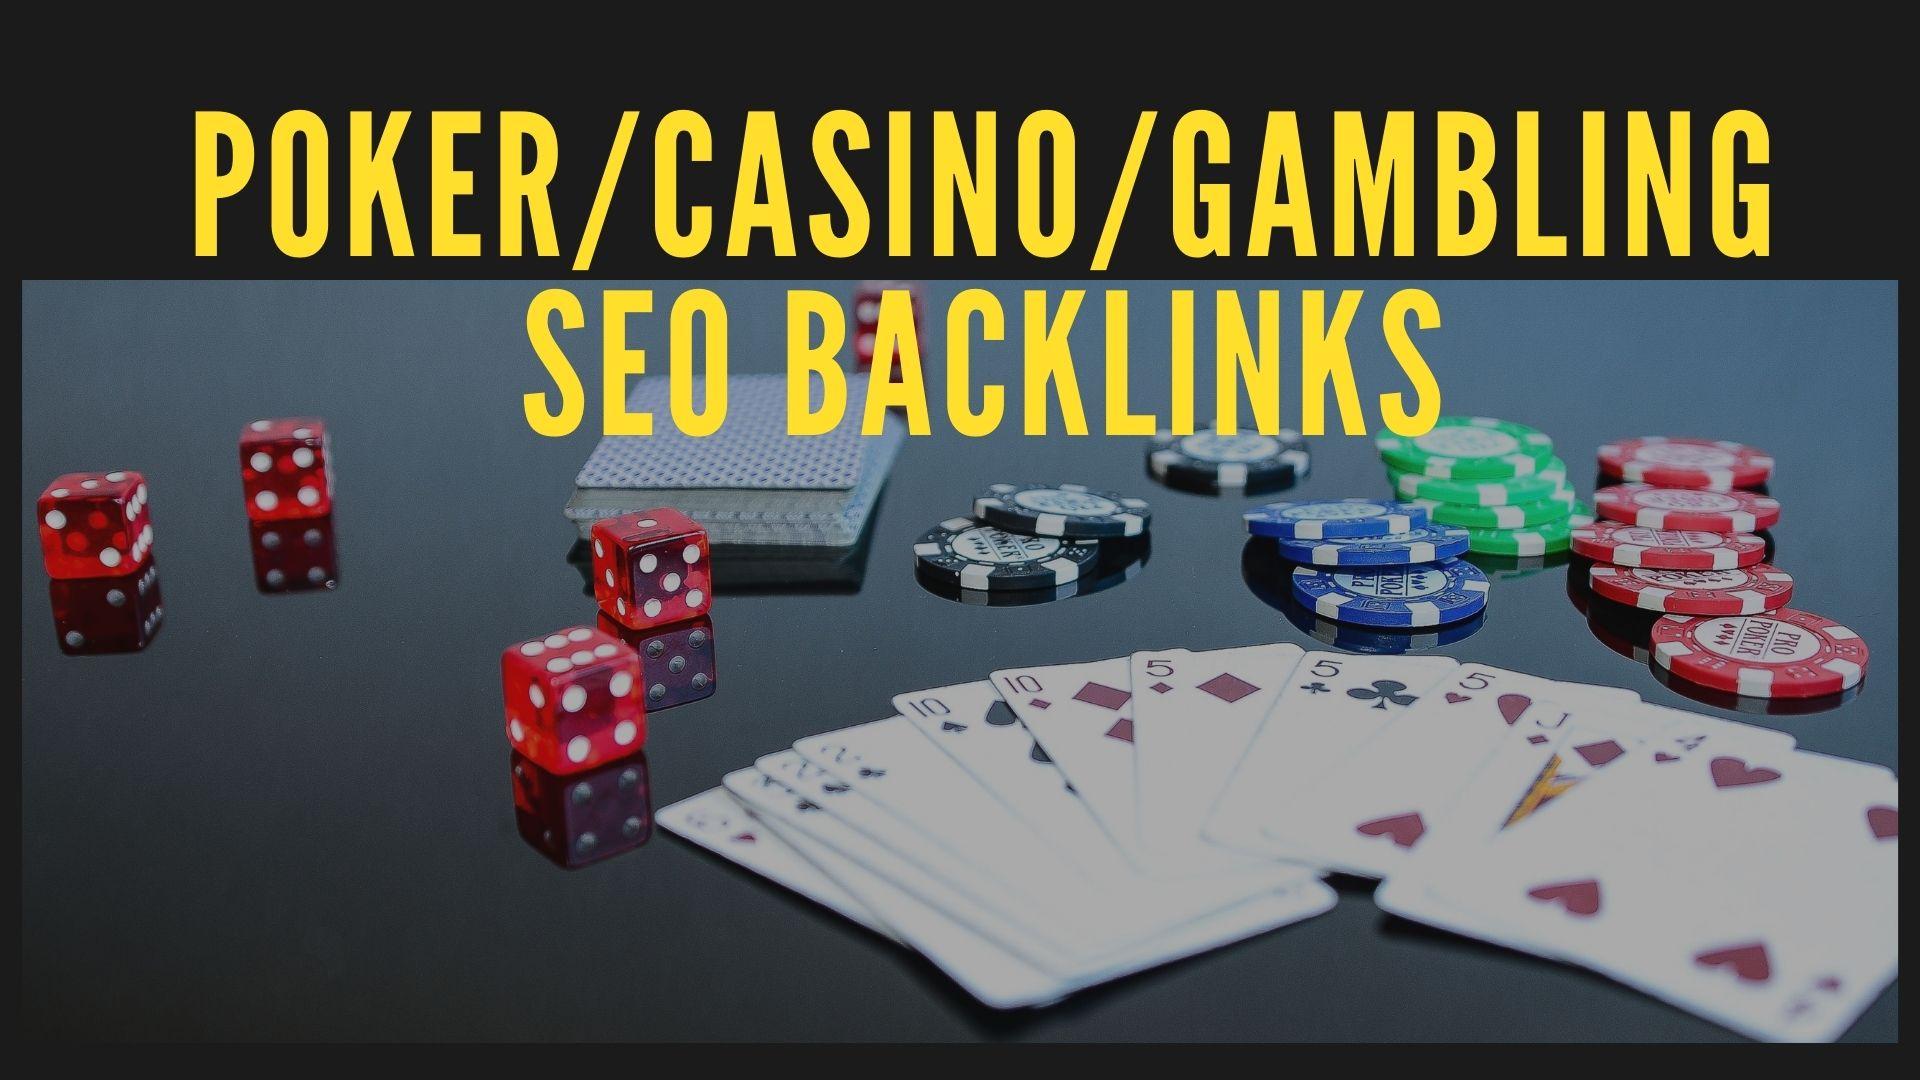 920+ Poker/Casino/gambling SEO Backlinks Pyramid for Fast Google Ranking